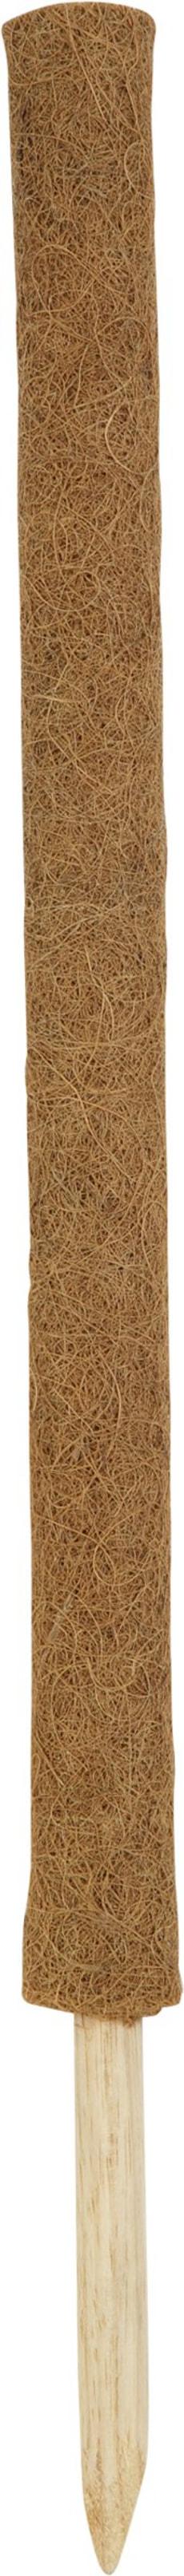 Kokos Pflanzenstab